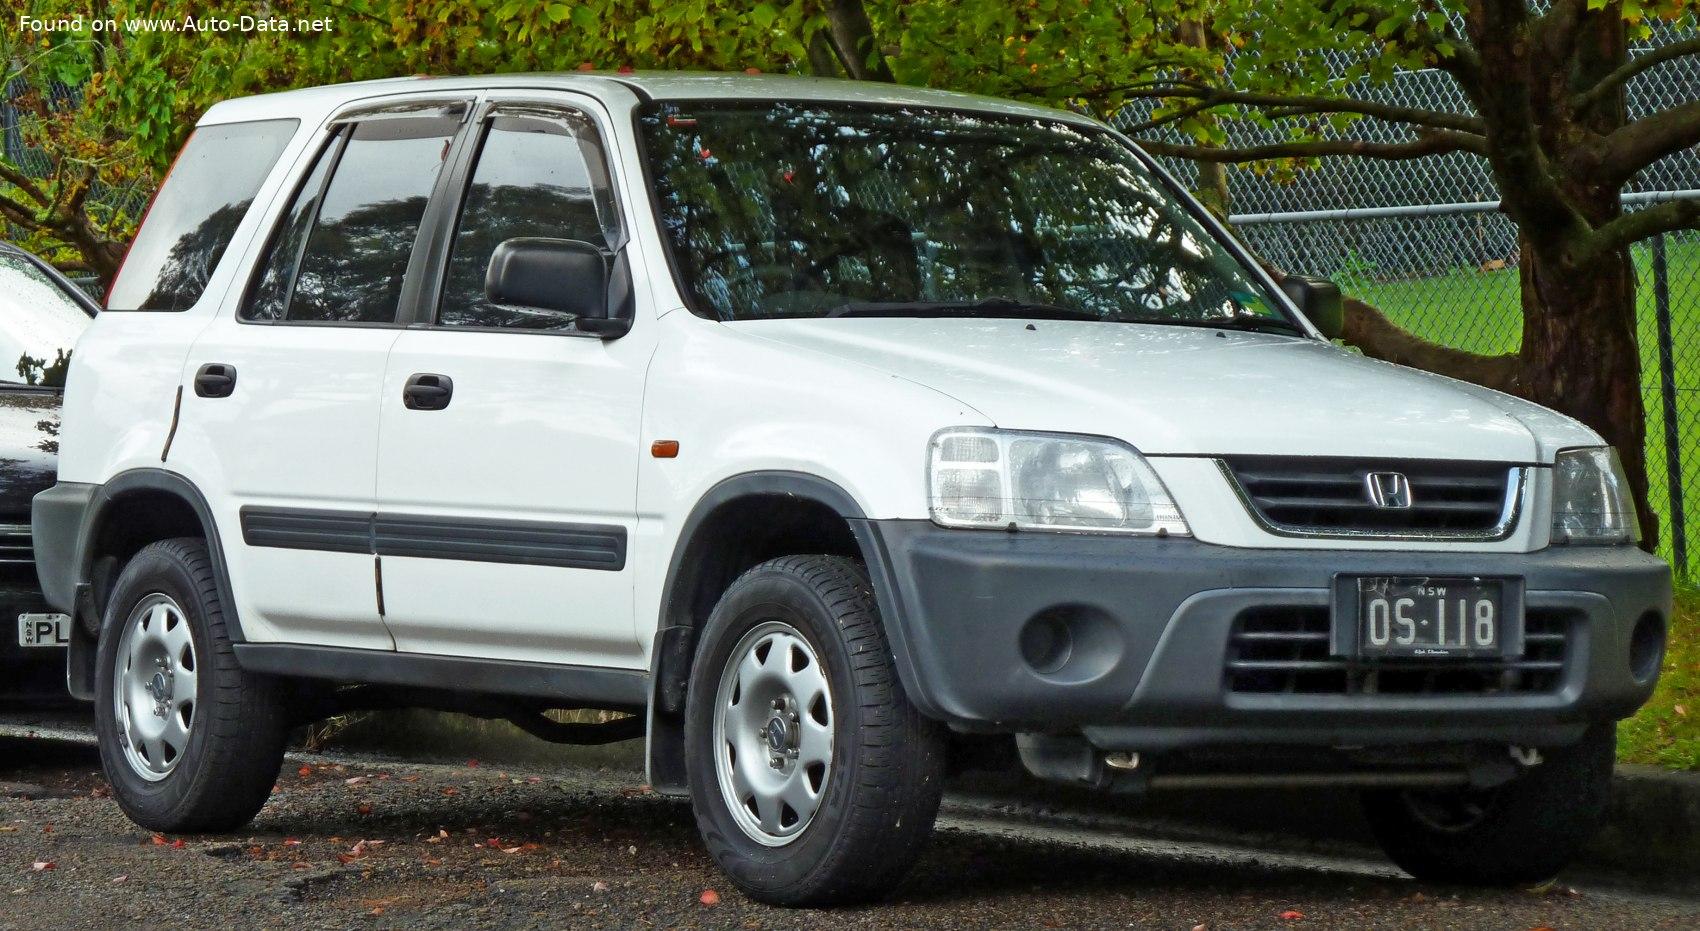 1995 Honda Cr V I Rd 2 0 16v Rd1 128 Hp Technical Specs Data Fuel Consumption Dimensions